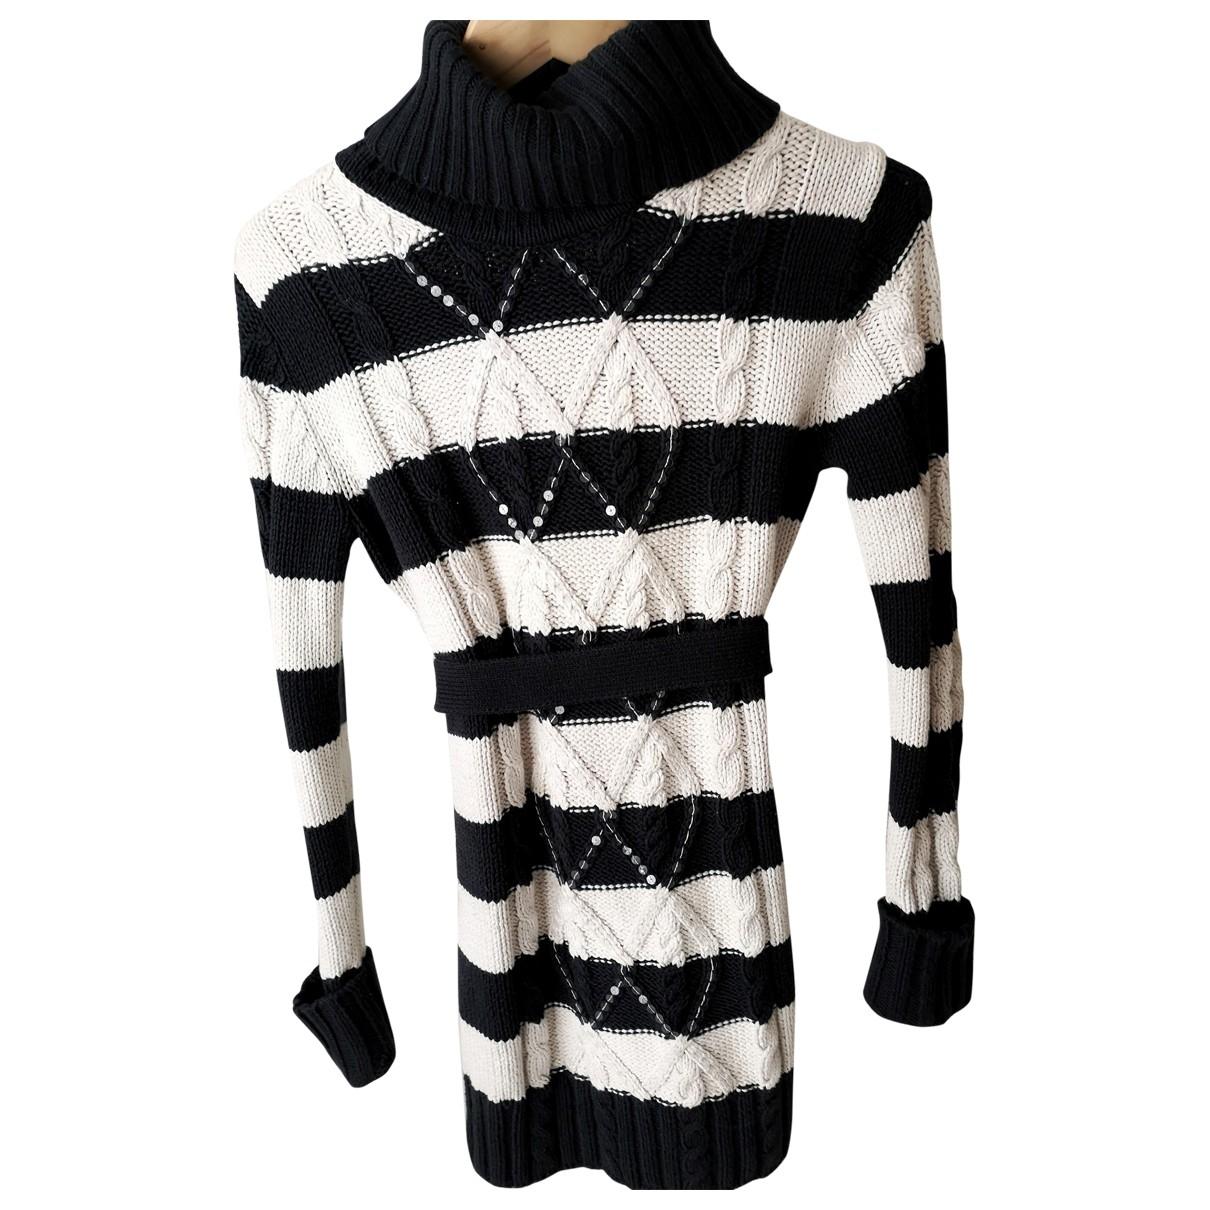 Tommy Hilfiger \N Kleid in  Weiss Wolle